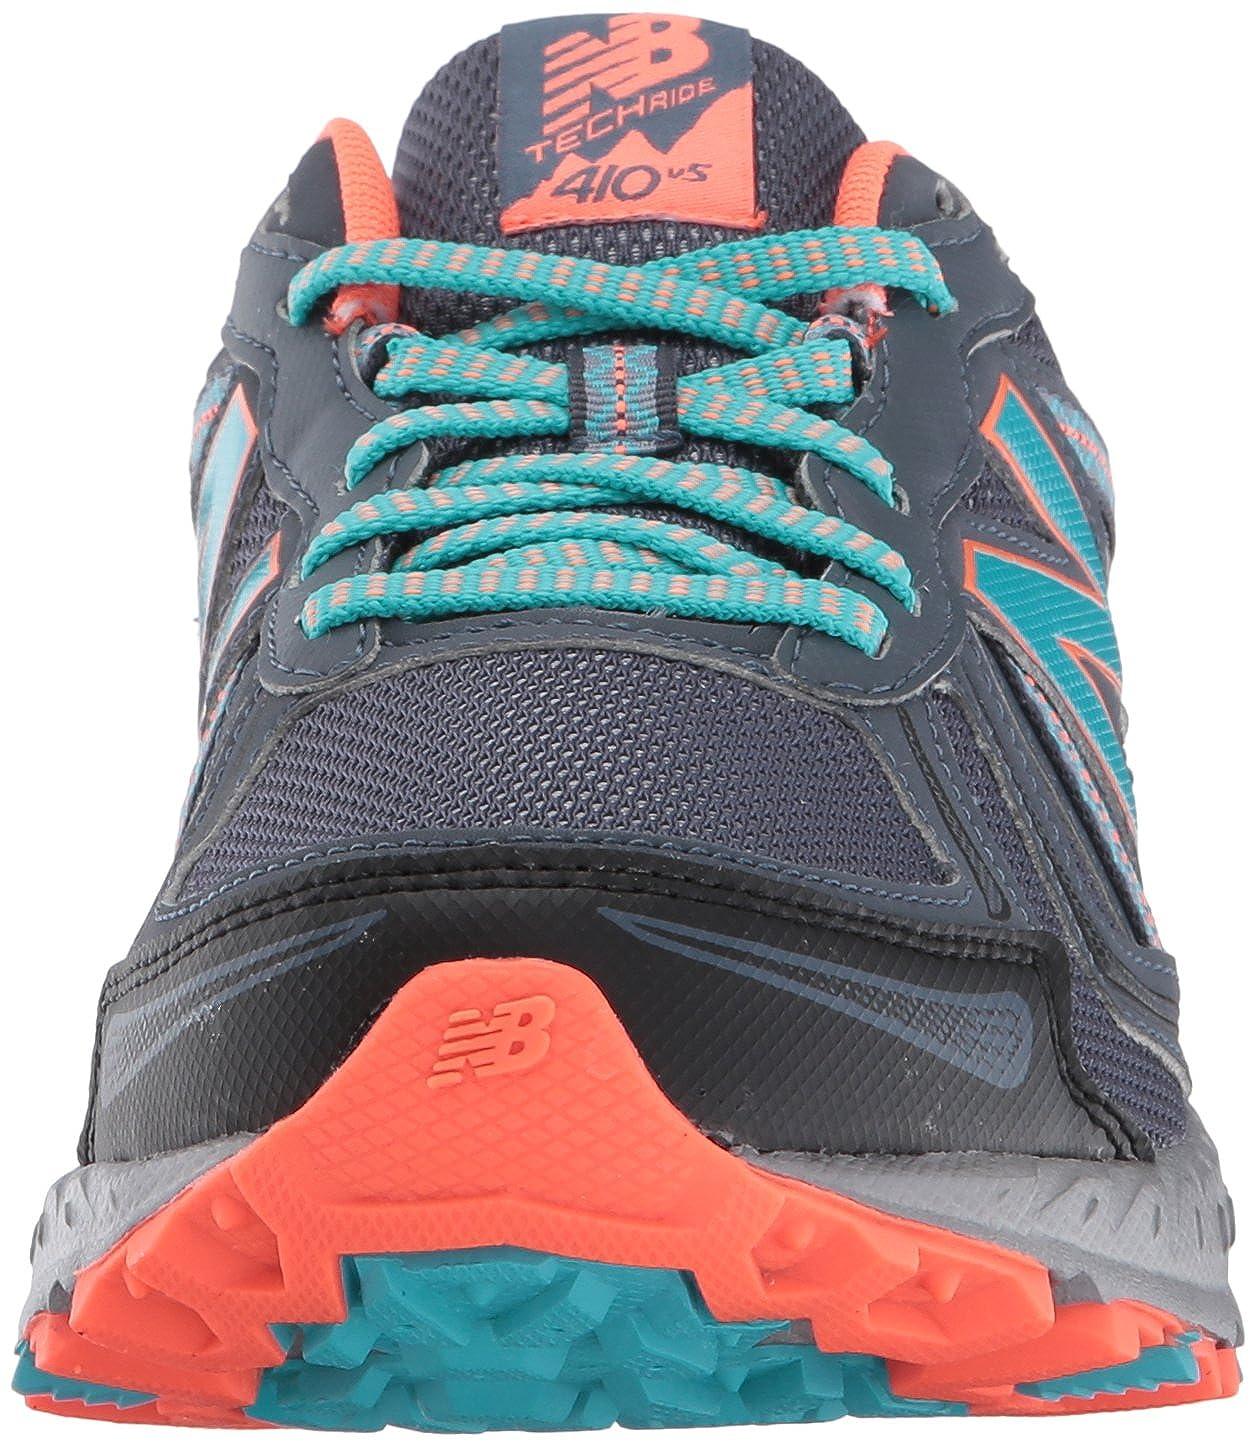 a9c46ed4a8dc8 Mules & Clogs New Balance Womens WT410v5 Cushioning Trail Running Shoe New  Balance Women's WT410v5 Cushioning ...